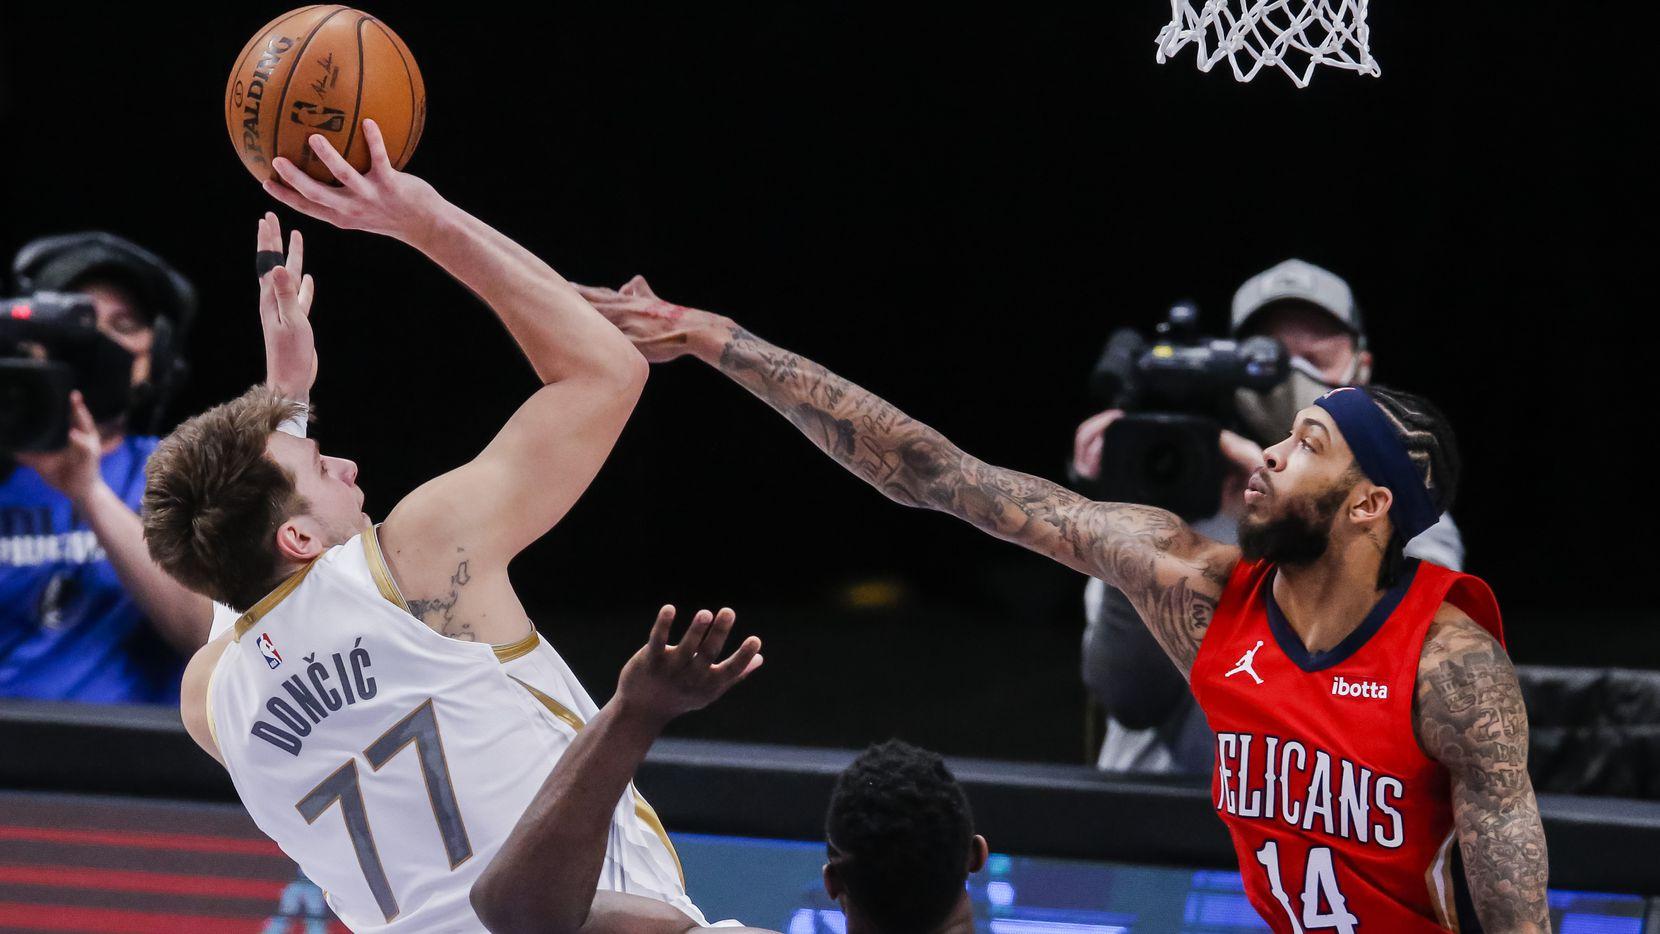 Dallas Mavericks guard Luka Doncic (77) attempts a shot as New Orleans Pelicans forward Brandon Ingram (14) defends during an NBA basketball game in Dallas, Friday, February 12, 2021. Dallas won 143-130.